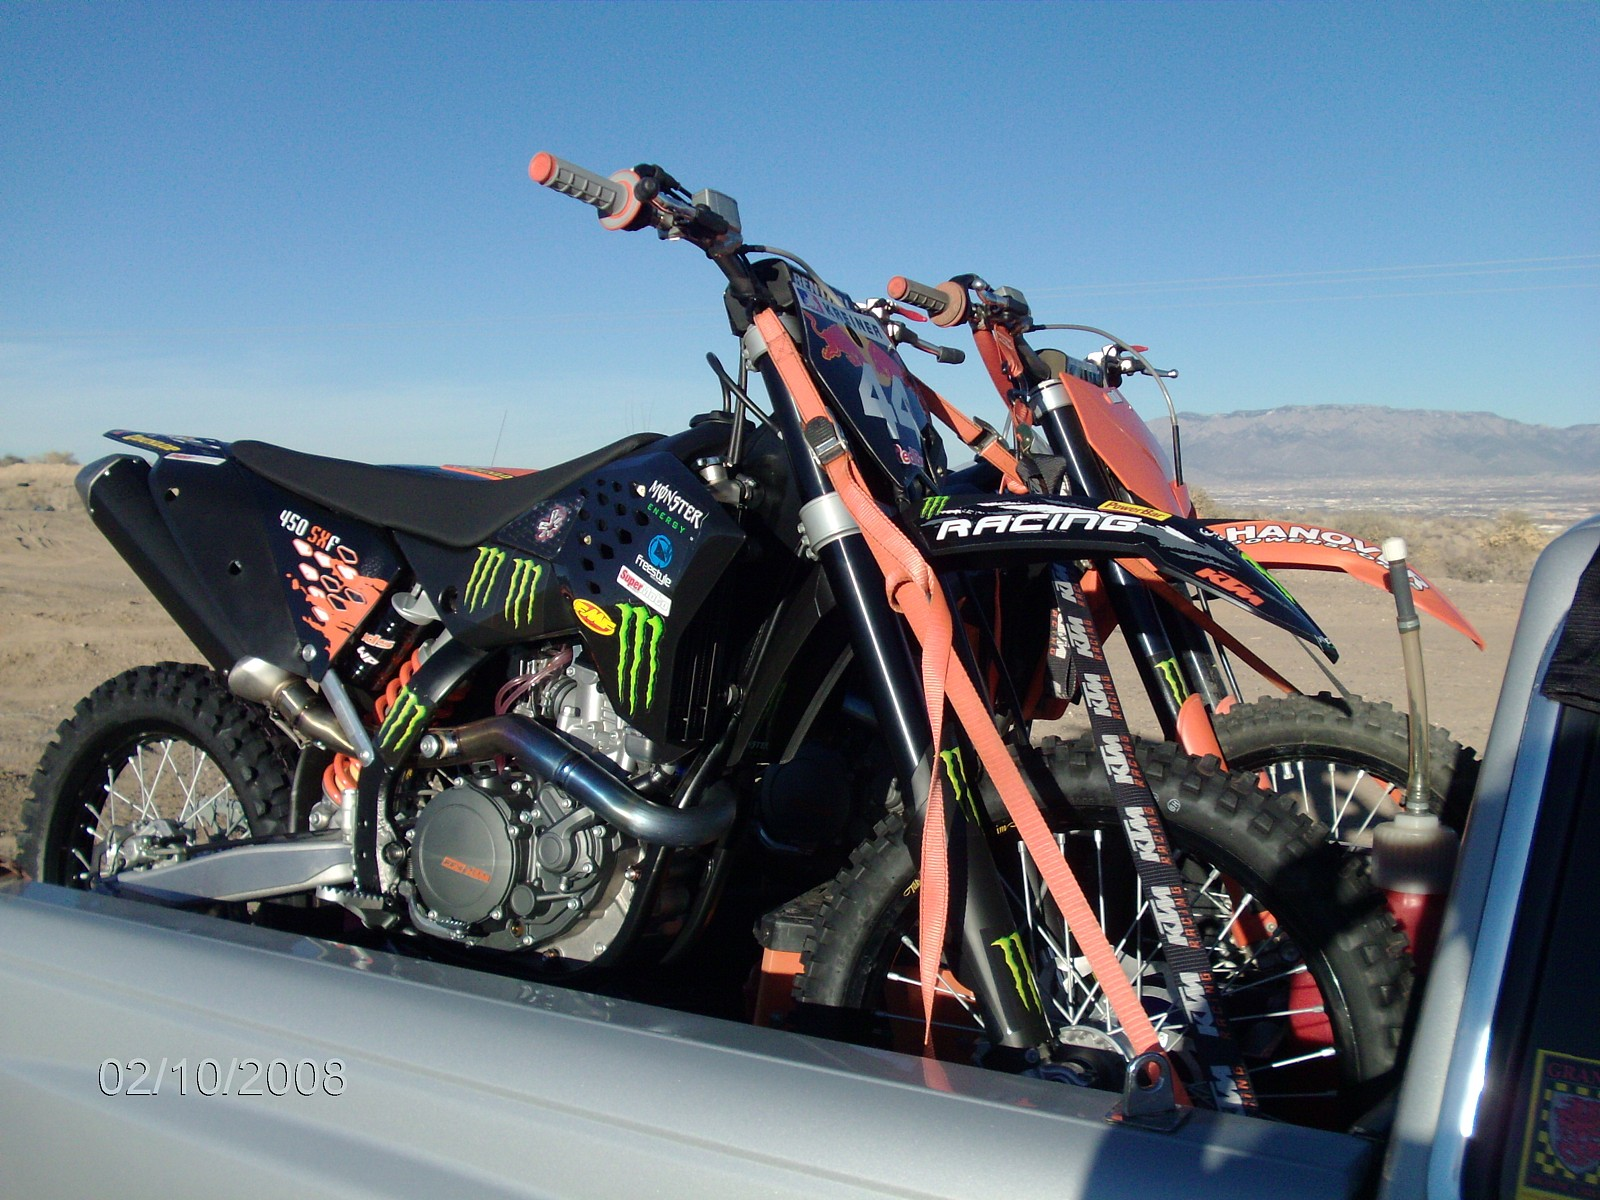 2007 KTM 450SXF and other KTM 505SXF - racerxusa - Motocross Pictures - Vital MX